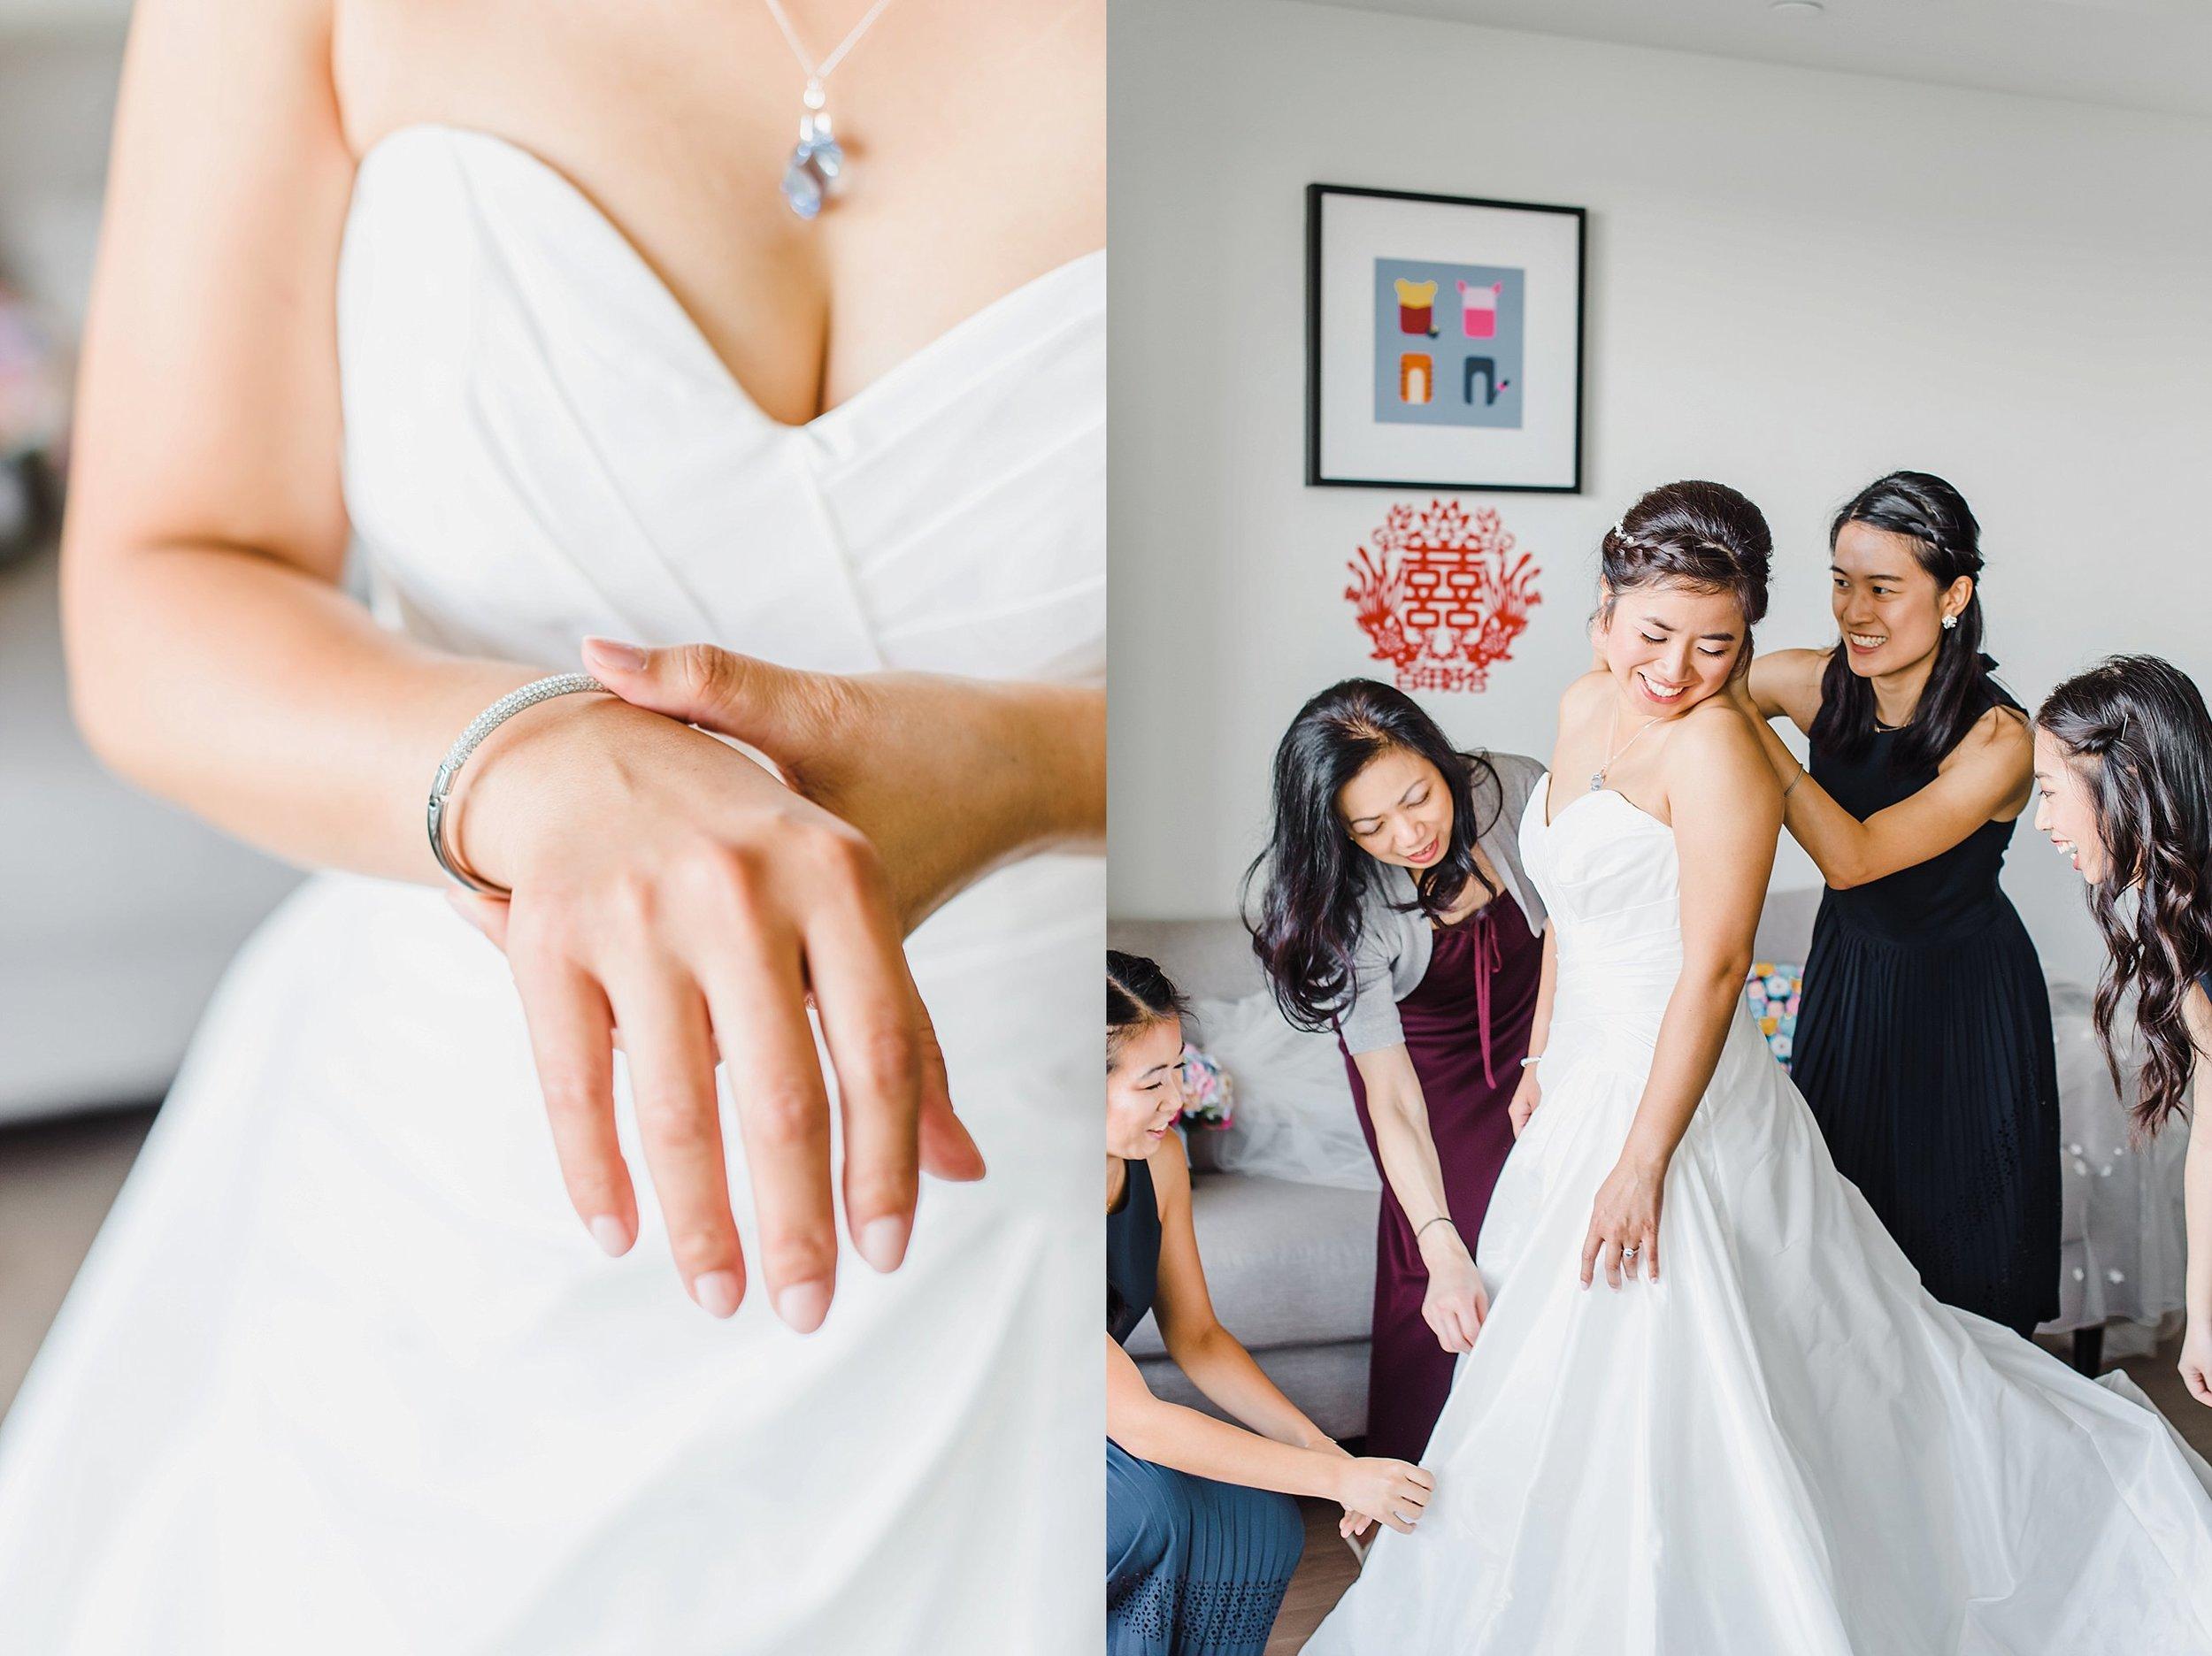 light airy indie fine art ottawa wedding photographer | Ali and Batoul Photography_1469.jpg